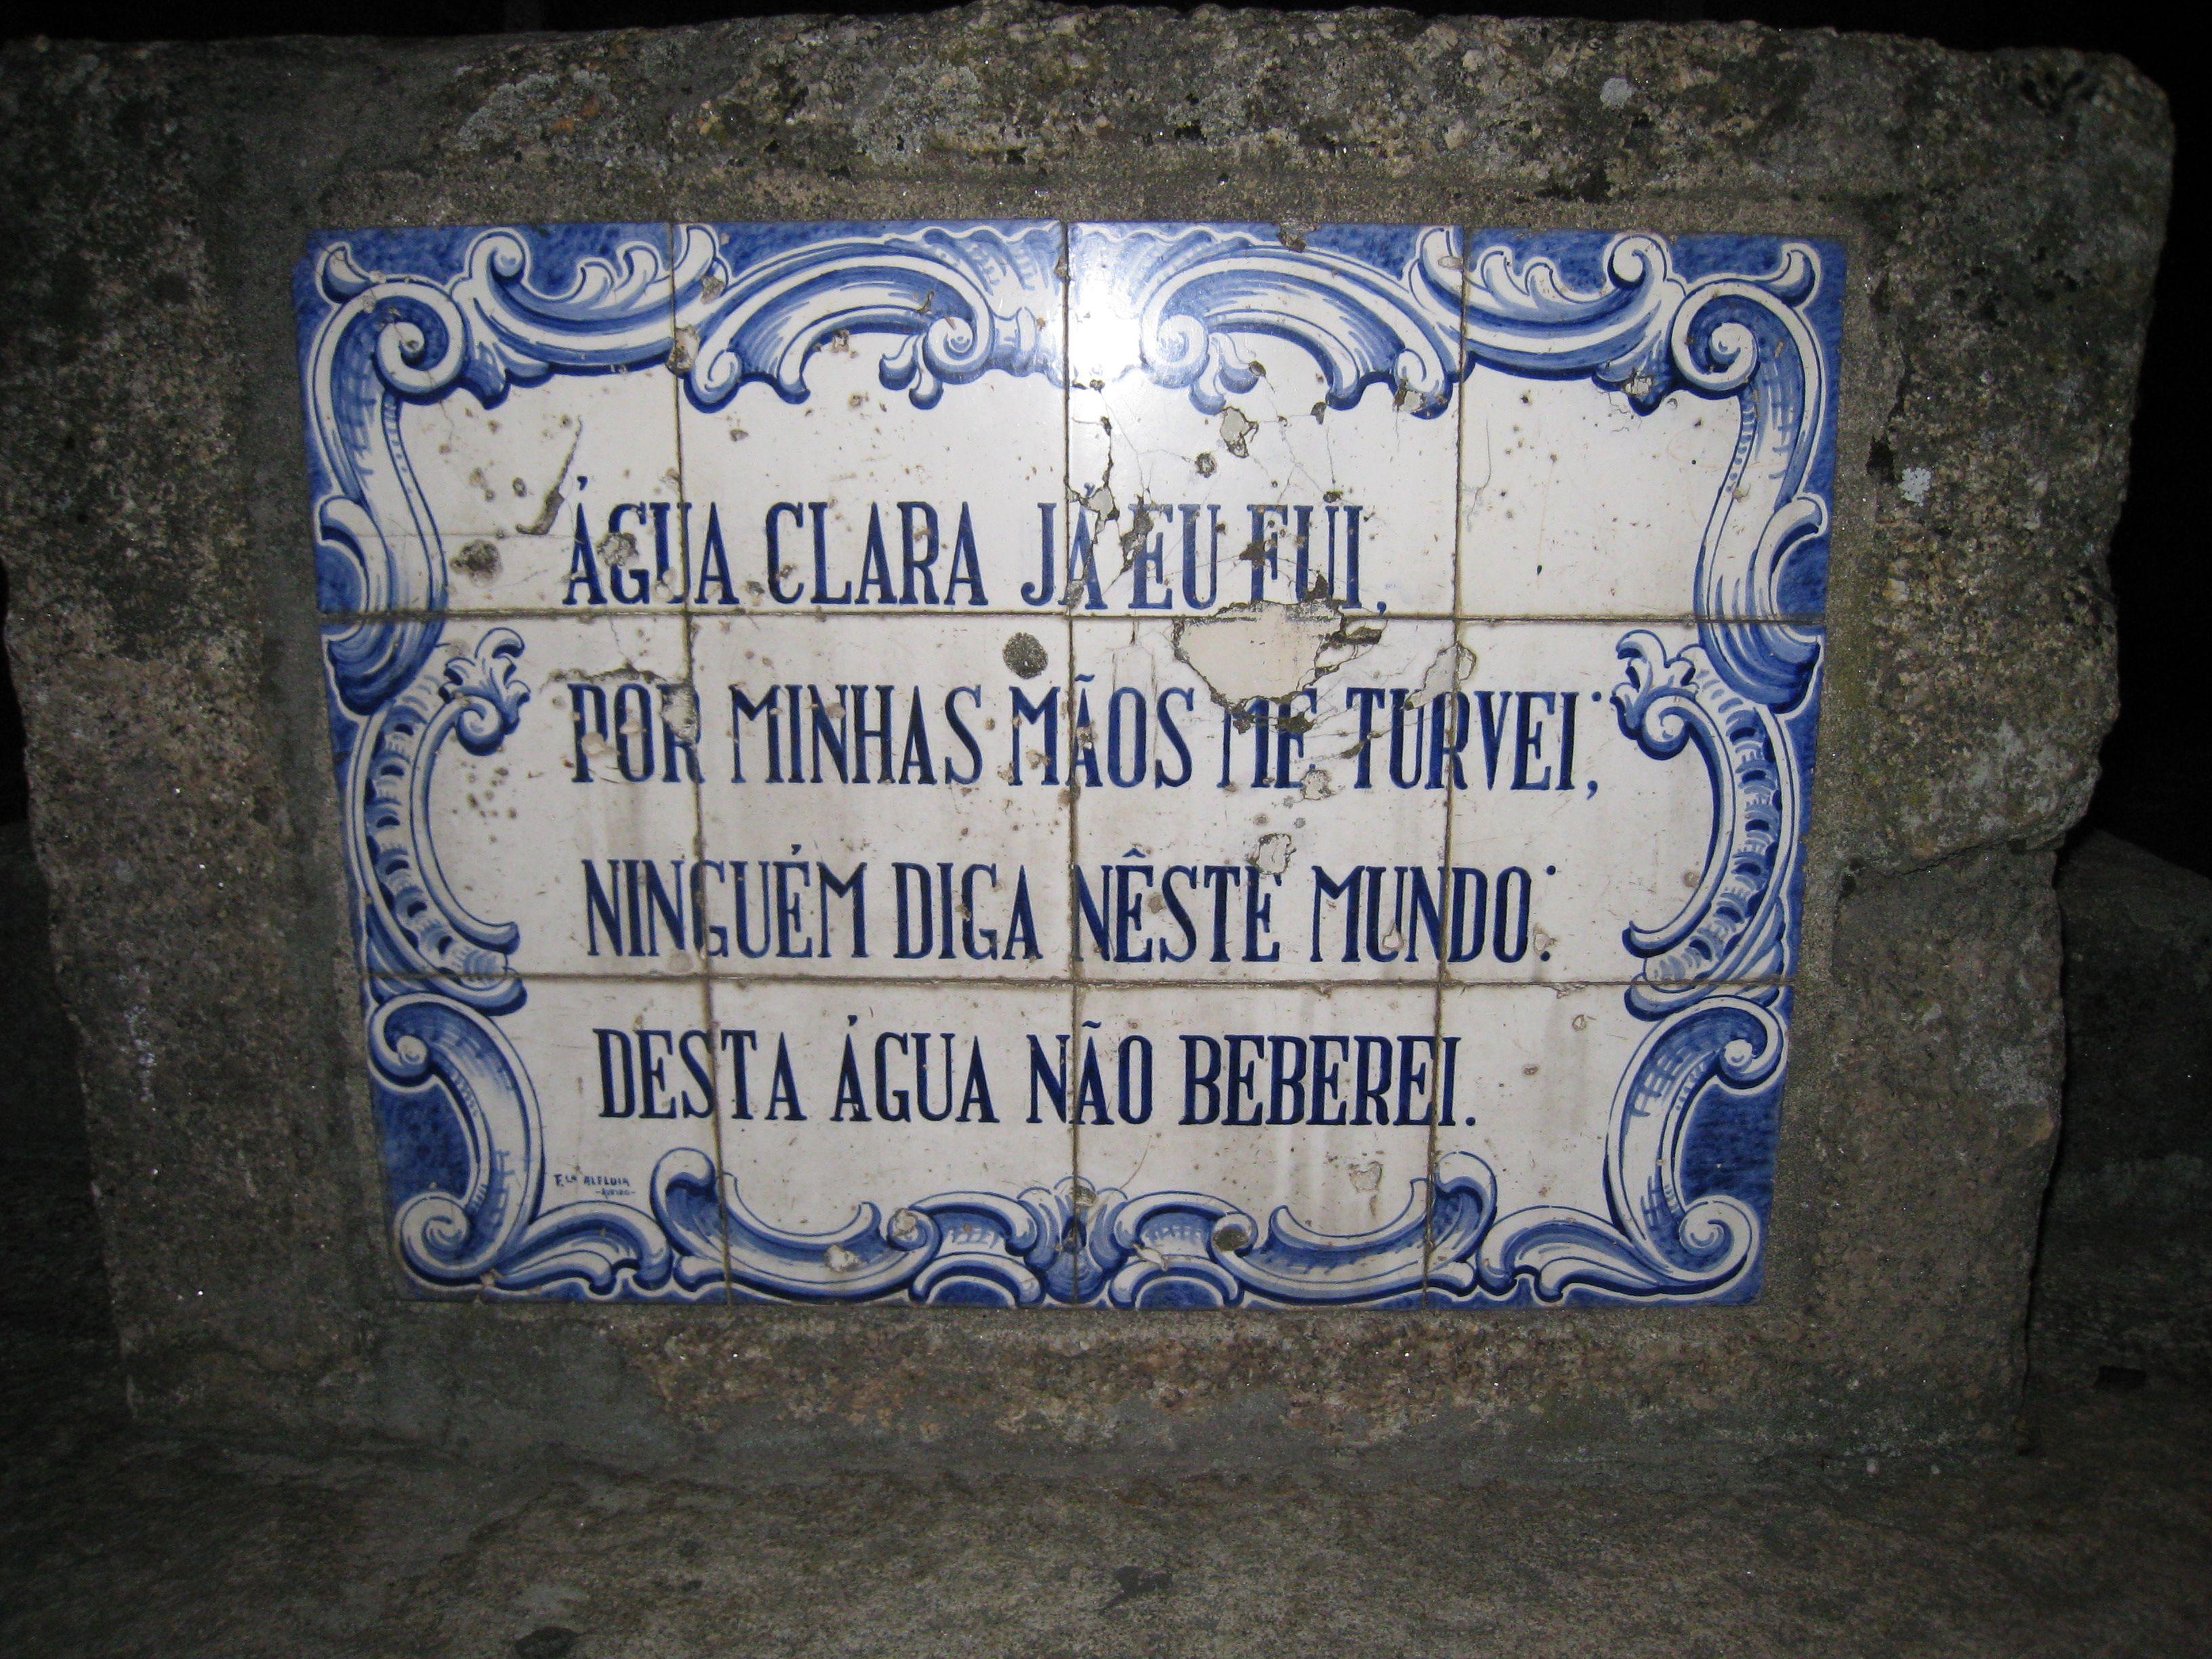 portugese spreuken en gezegden Provérbios Populares. | Portugal   azulejos   Proverbs, Sayings en  portugese spreuken en gezegden